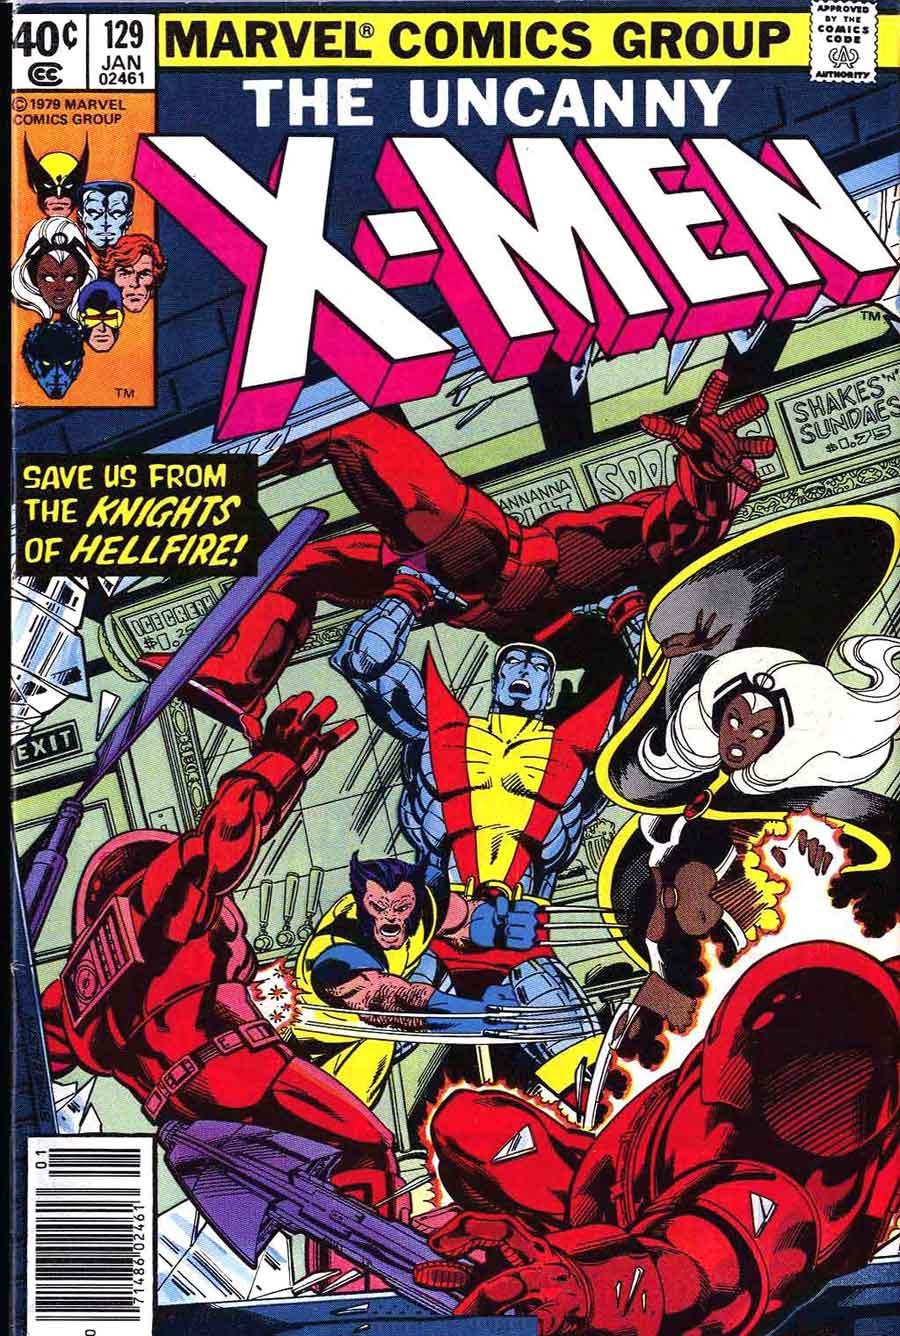 X-men #129 - John Byrne art & cover - Pencil Ink